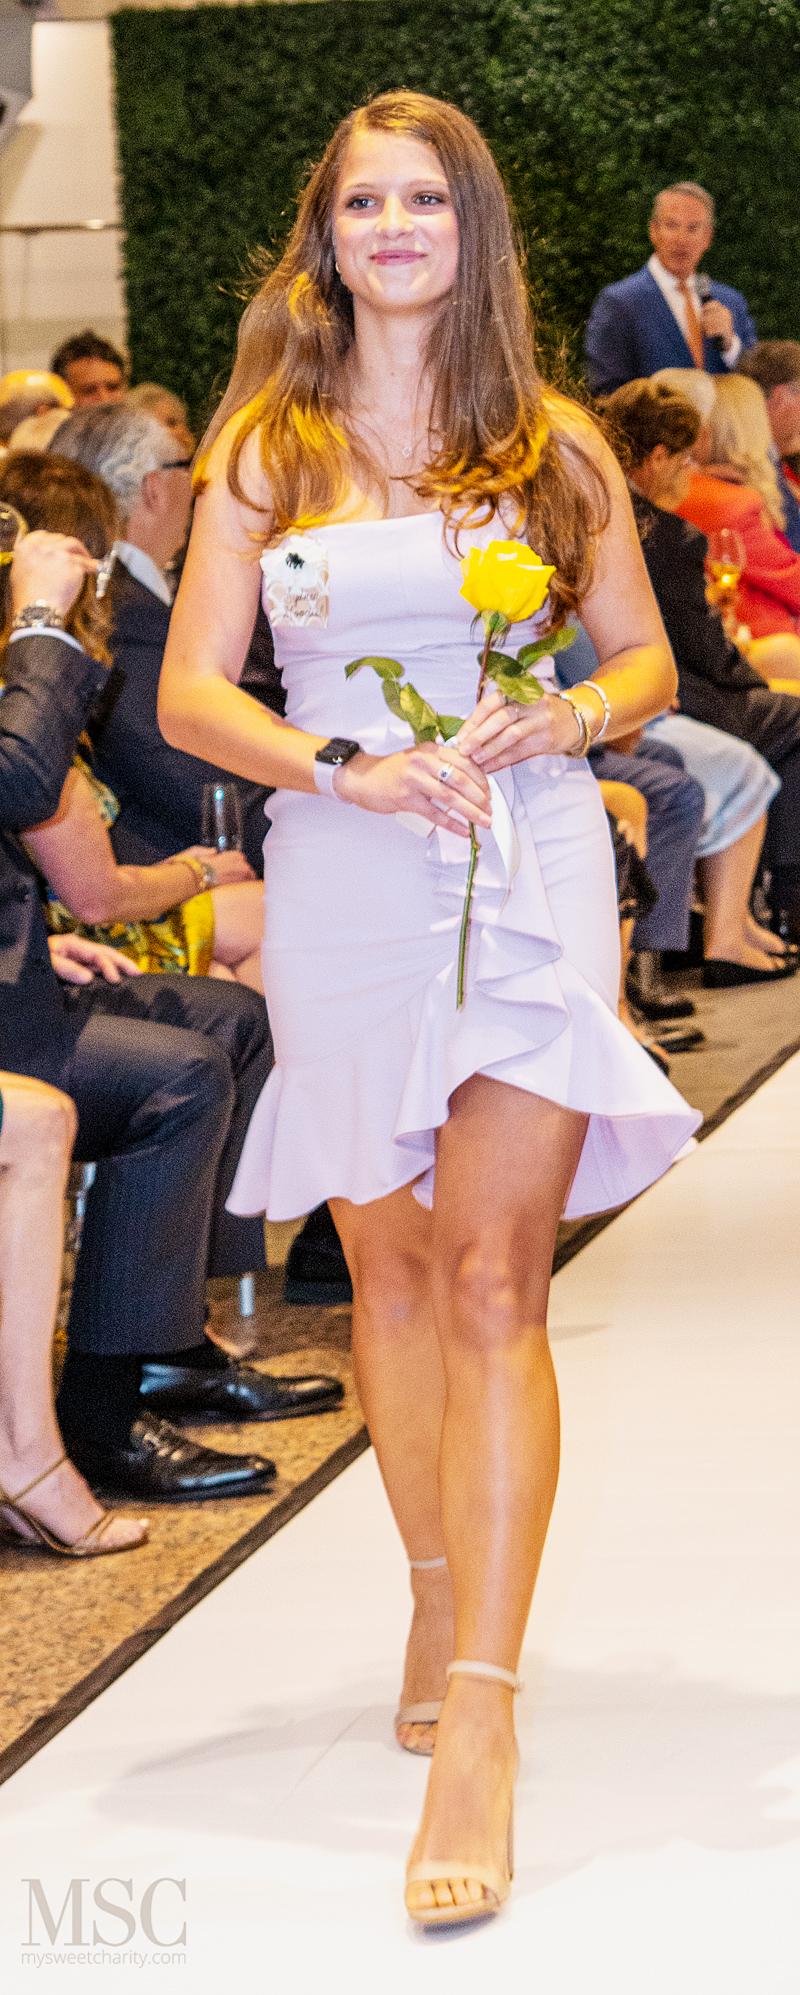 Sydney Goodiel